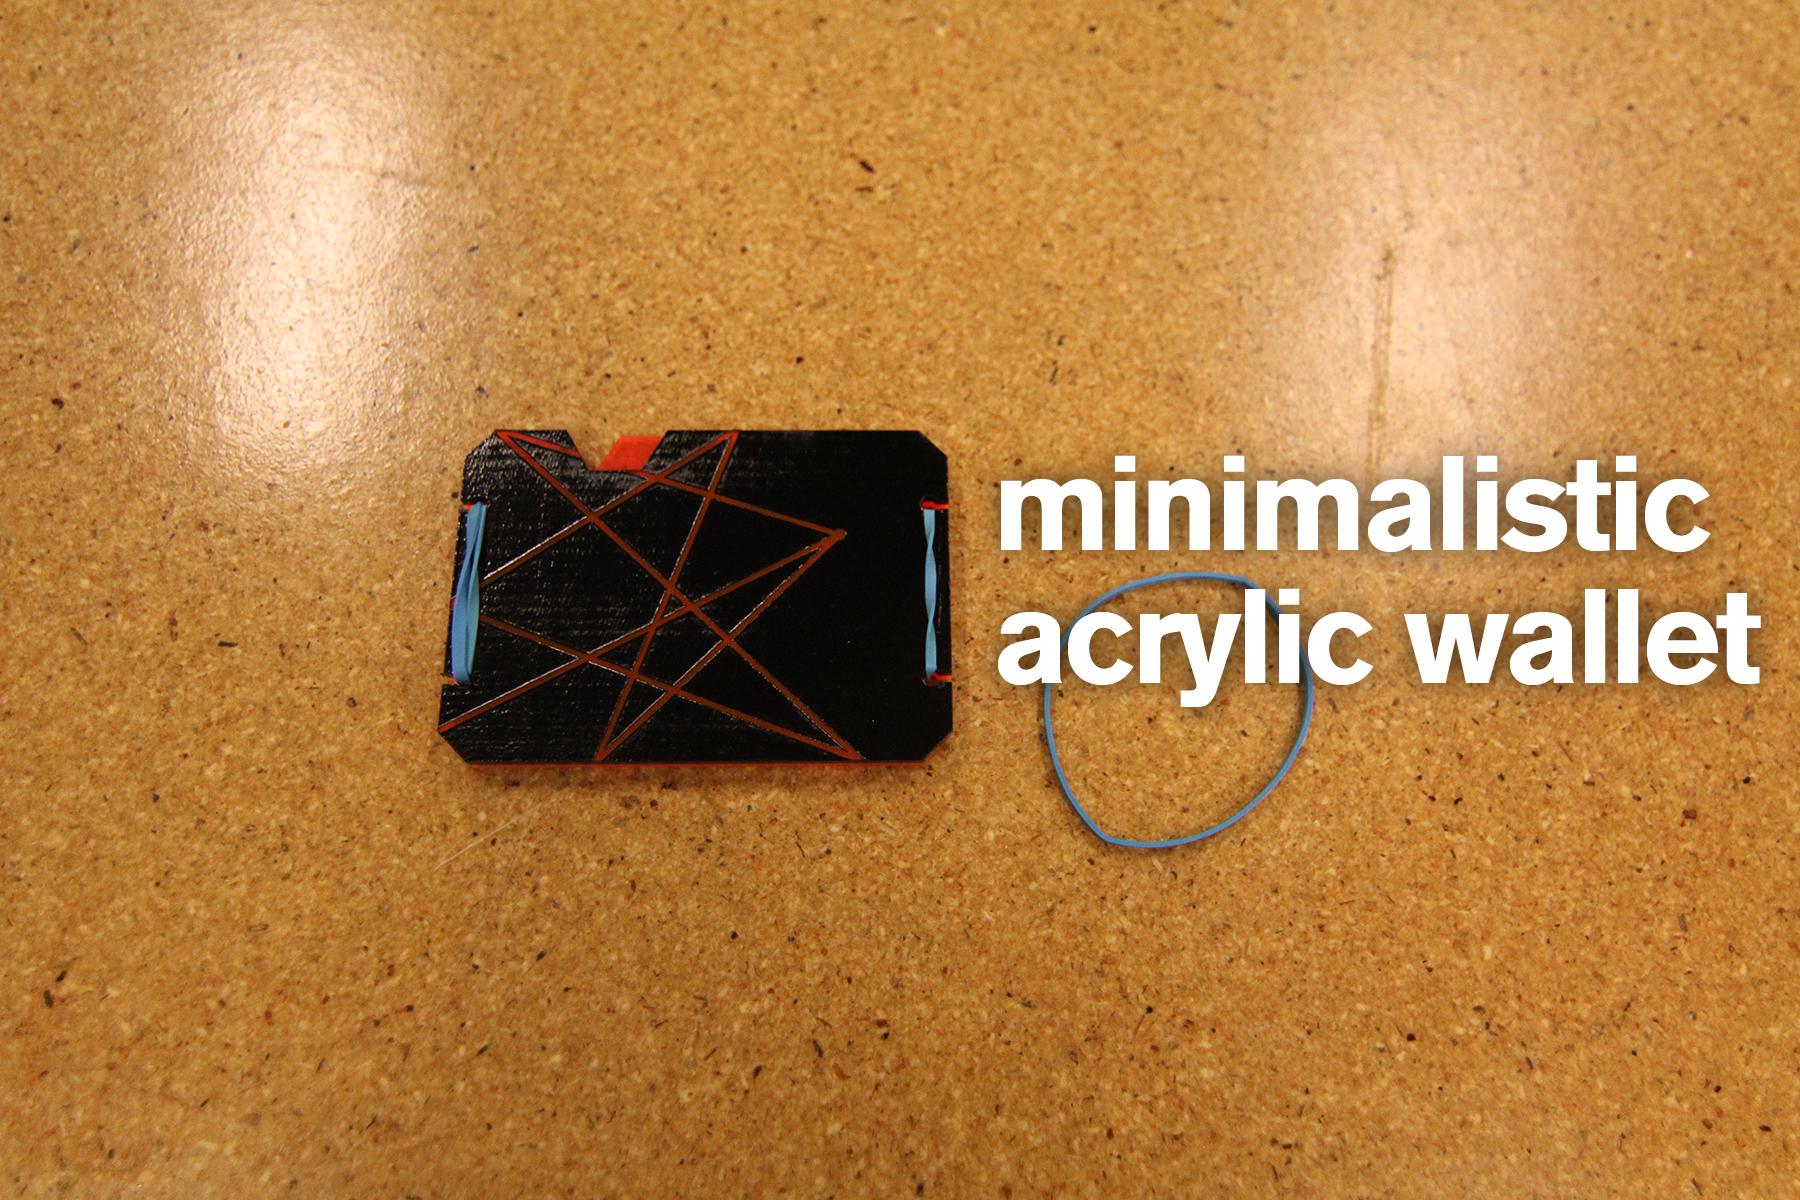 Minimalistic Acrylic Wallet.